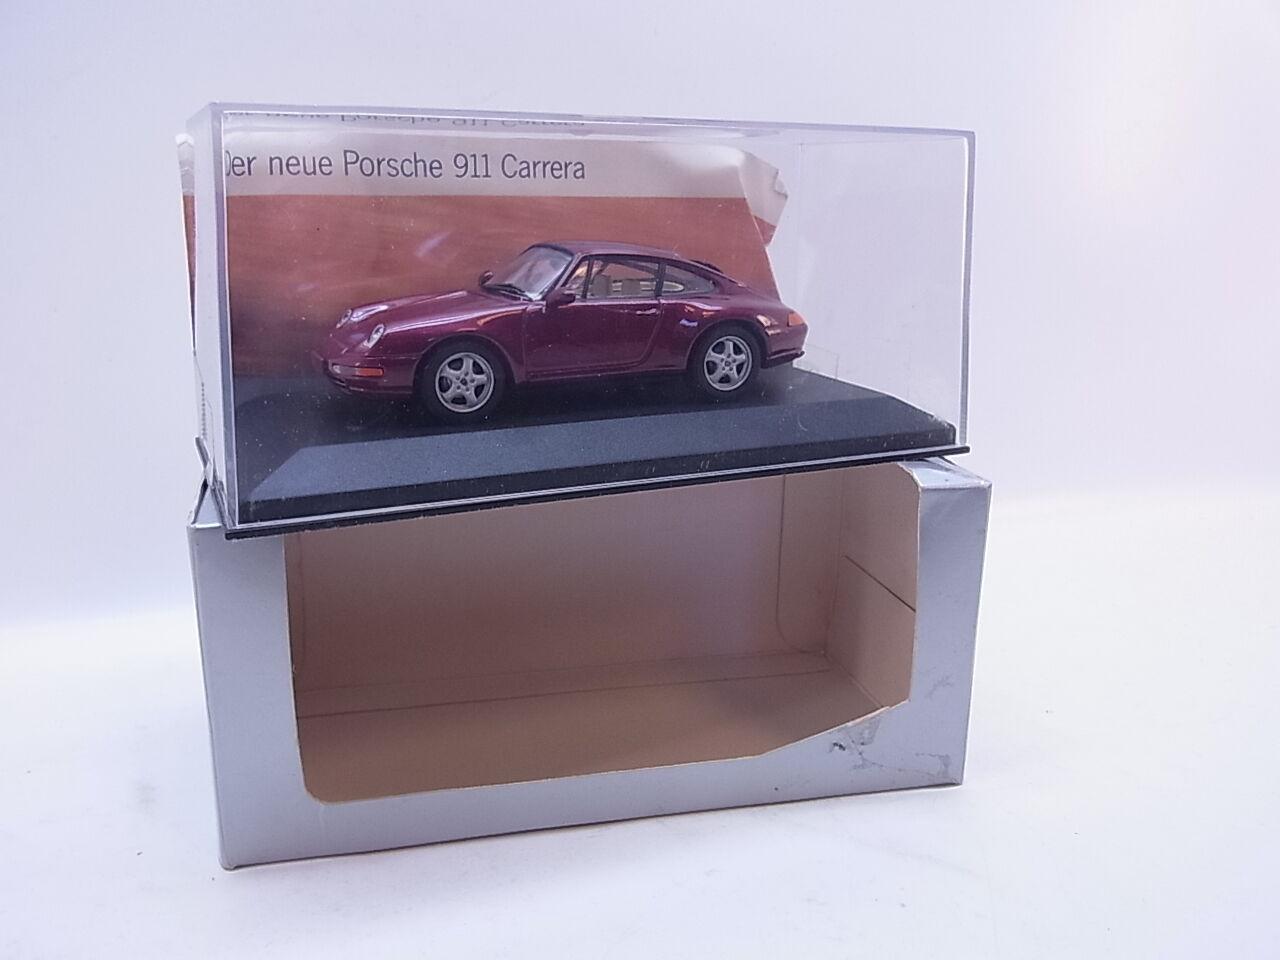 LOT 40692 Minichamps Porsche 911 Coupe Typ Typ Typ 993 rot-metallic Modellauto 1 43 OVP  | Angenehmes Gefühl  b3a276